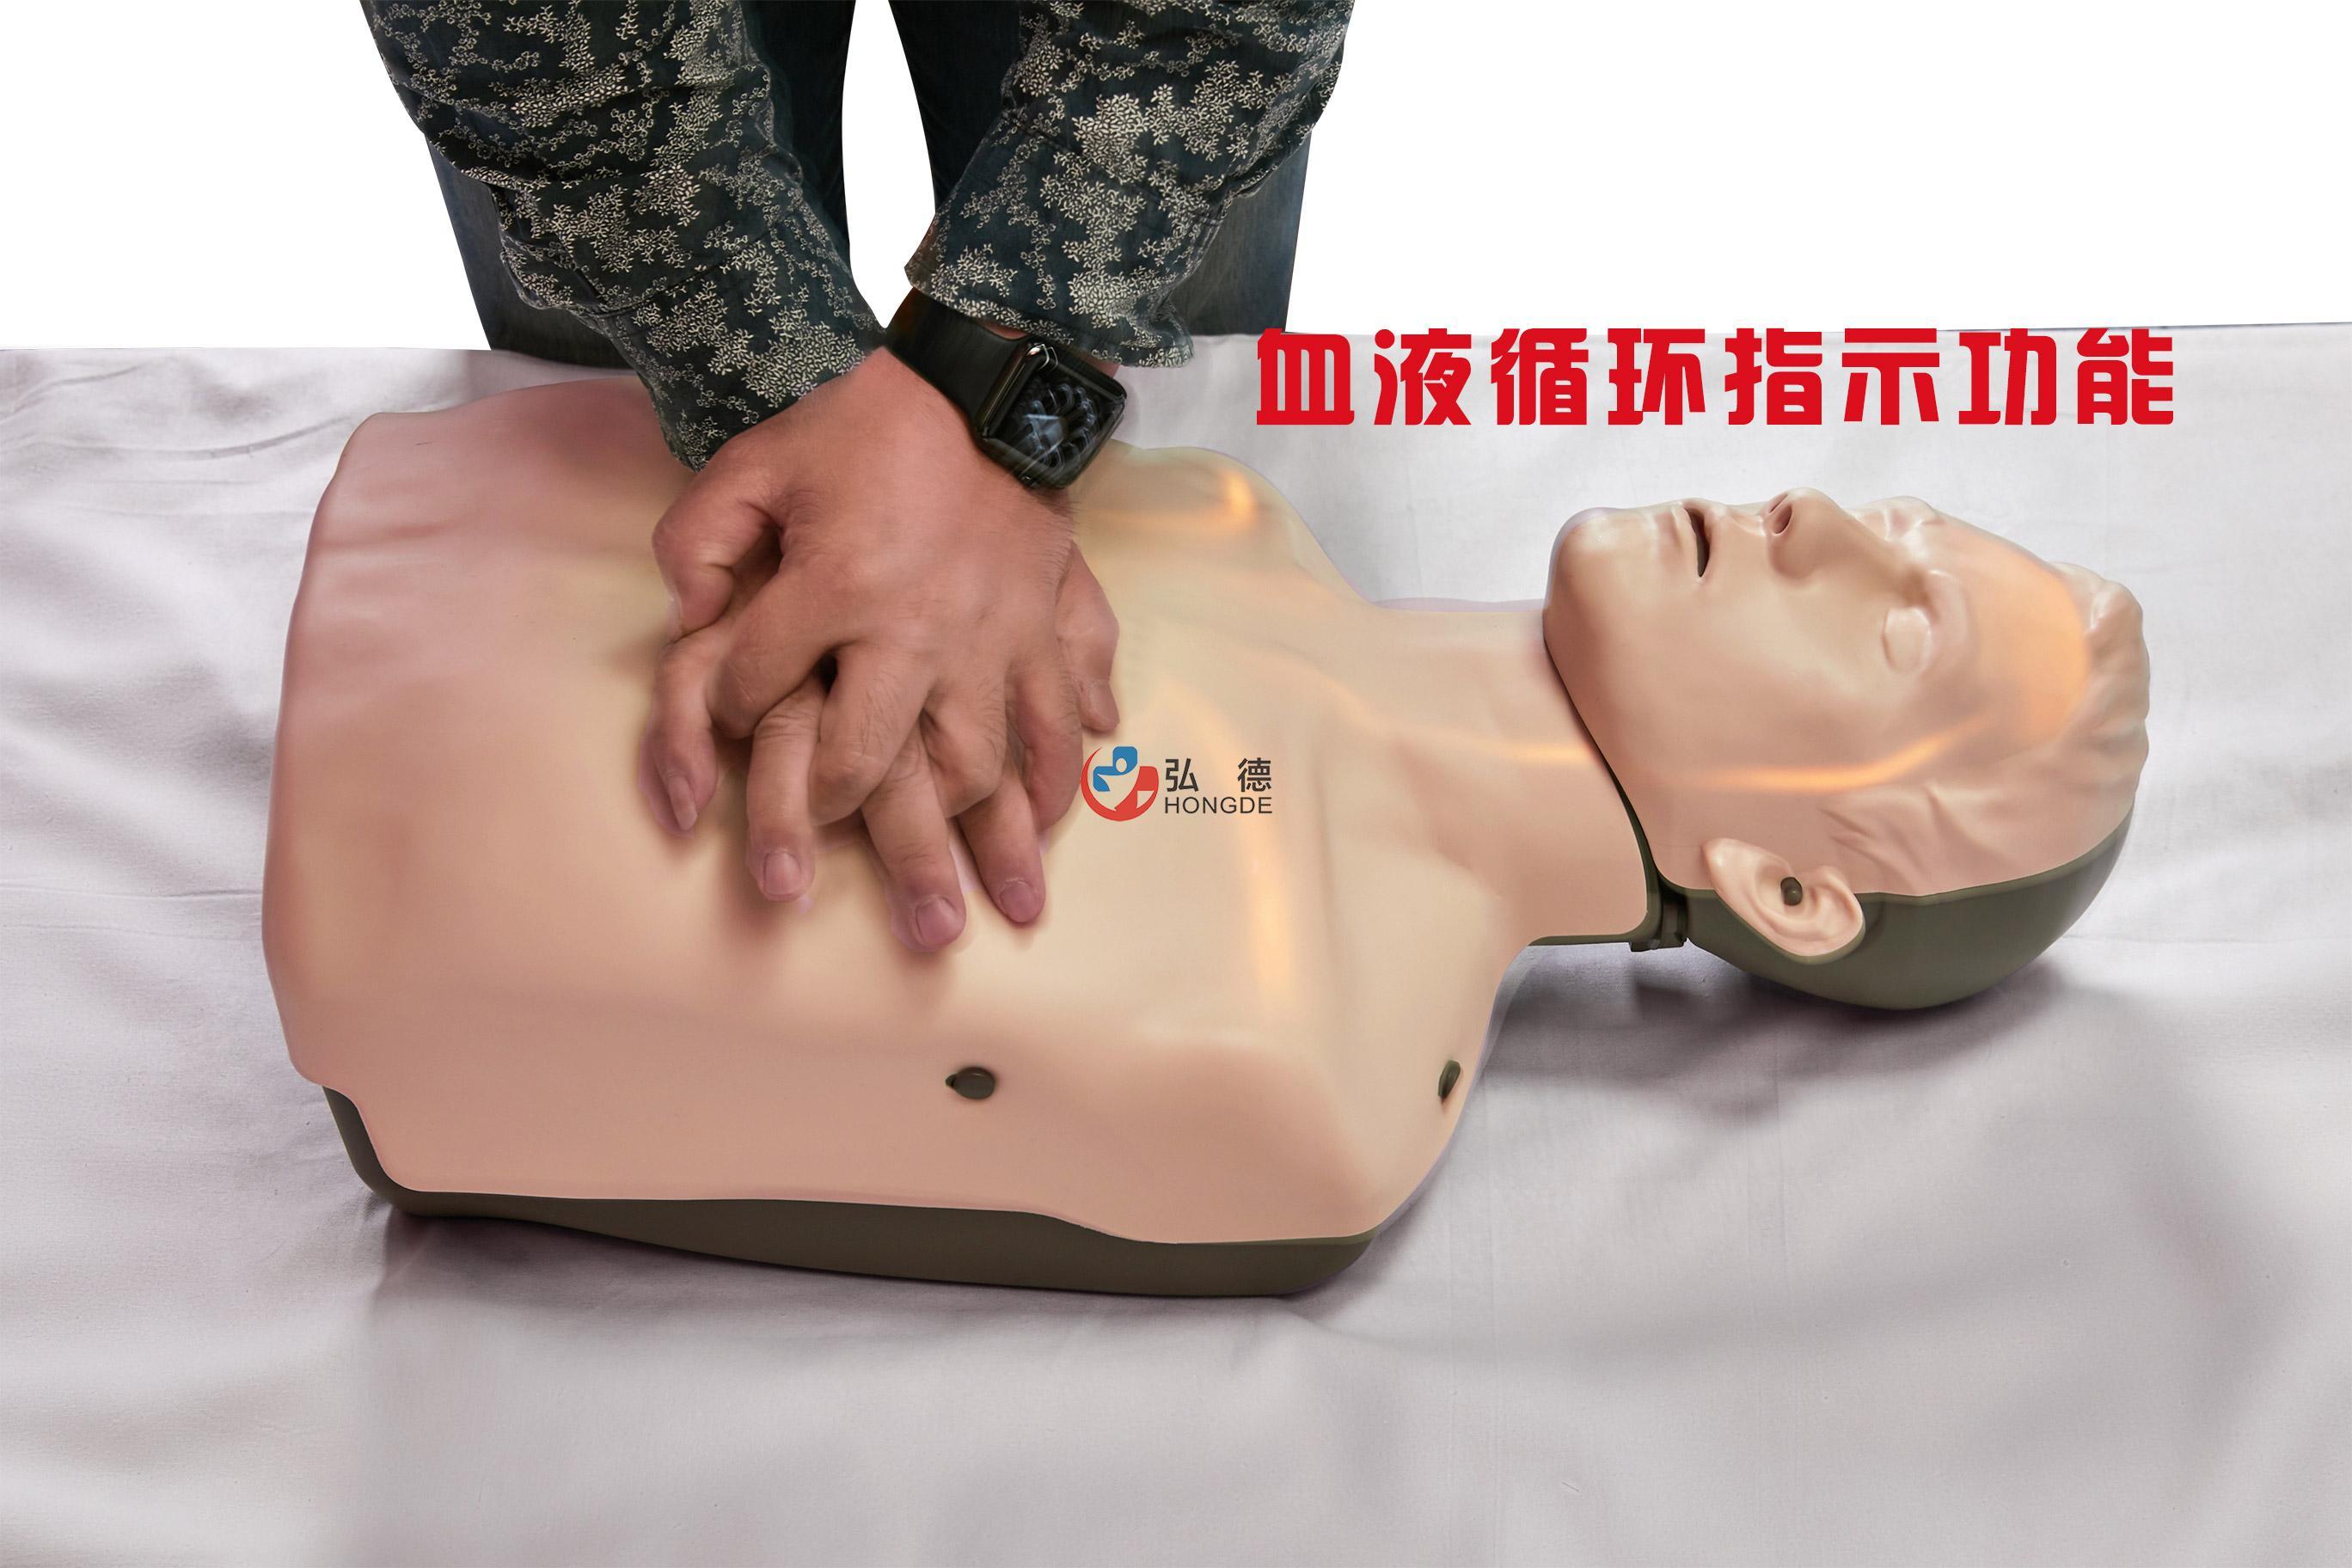 CPR180S血流可视化高级心肺复苏半身模拟人